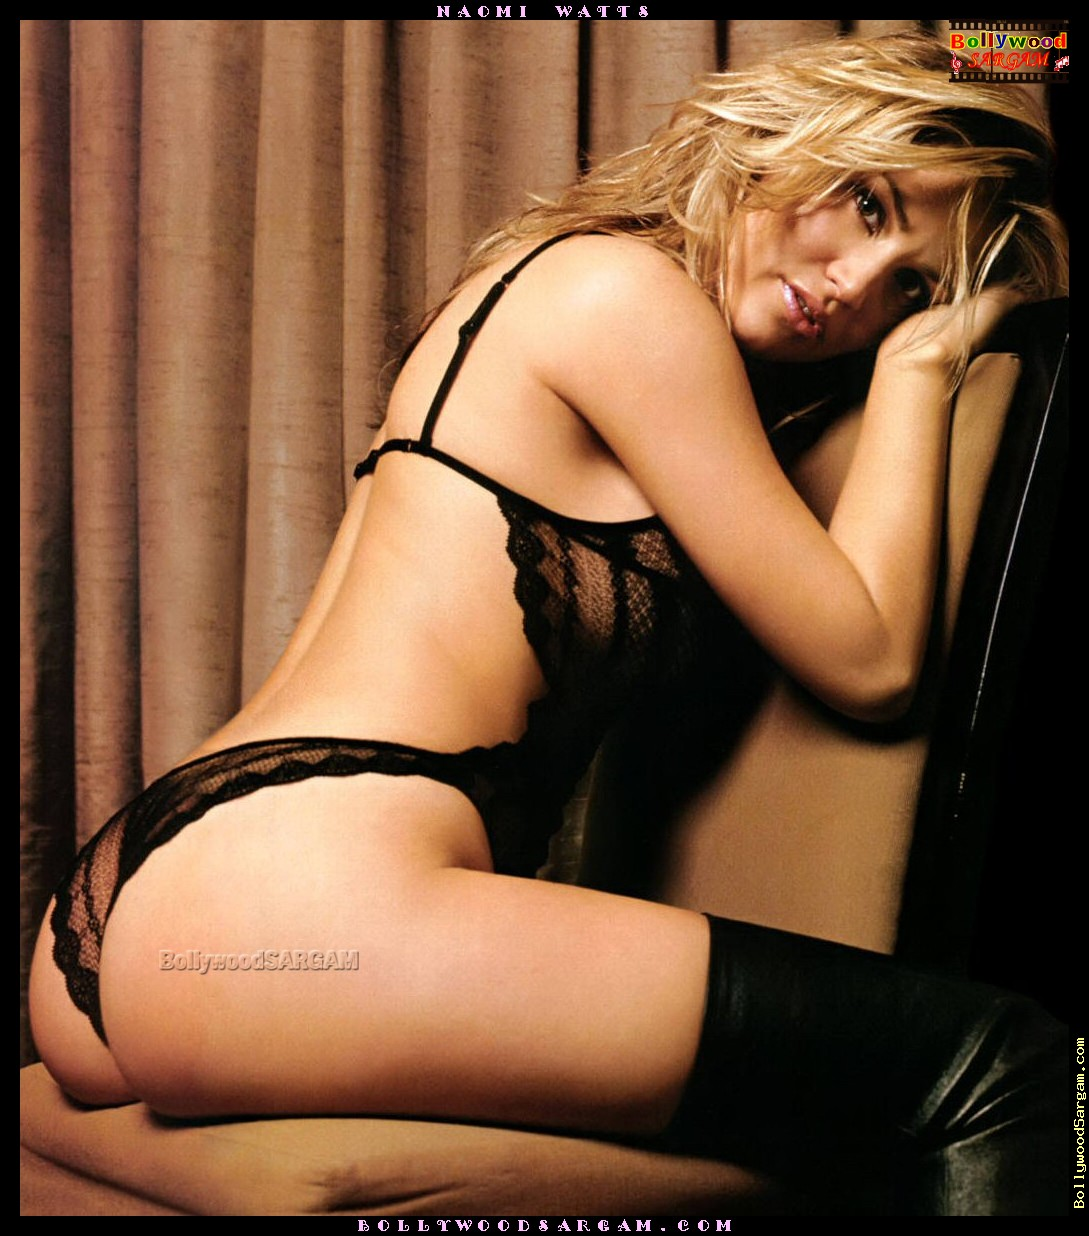 http://3.bp.blogspot.com/-zswwXitntbY/TrlUhClGALI/AAAAAAAADew/S4zmnOAiG40/s1600/Naomi+Watts+Hot-8.jpg